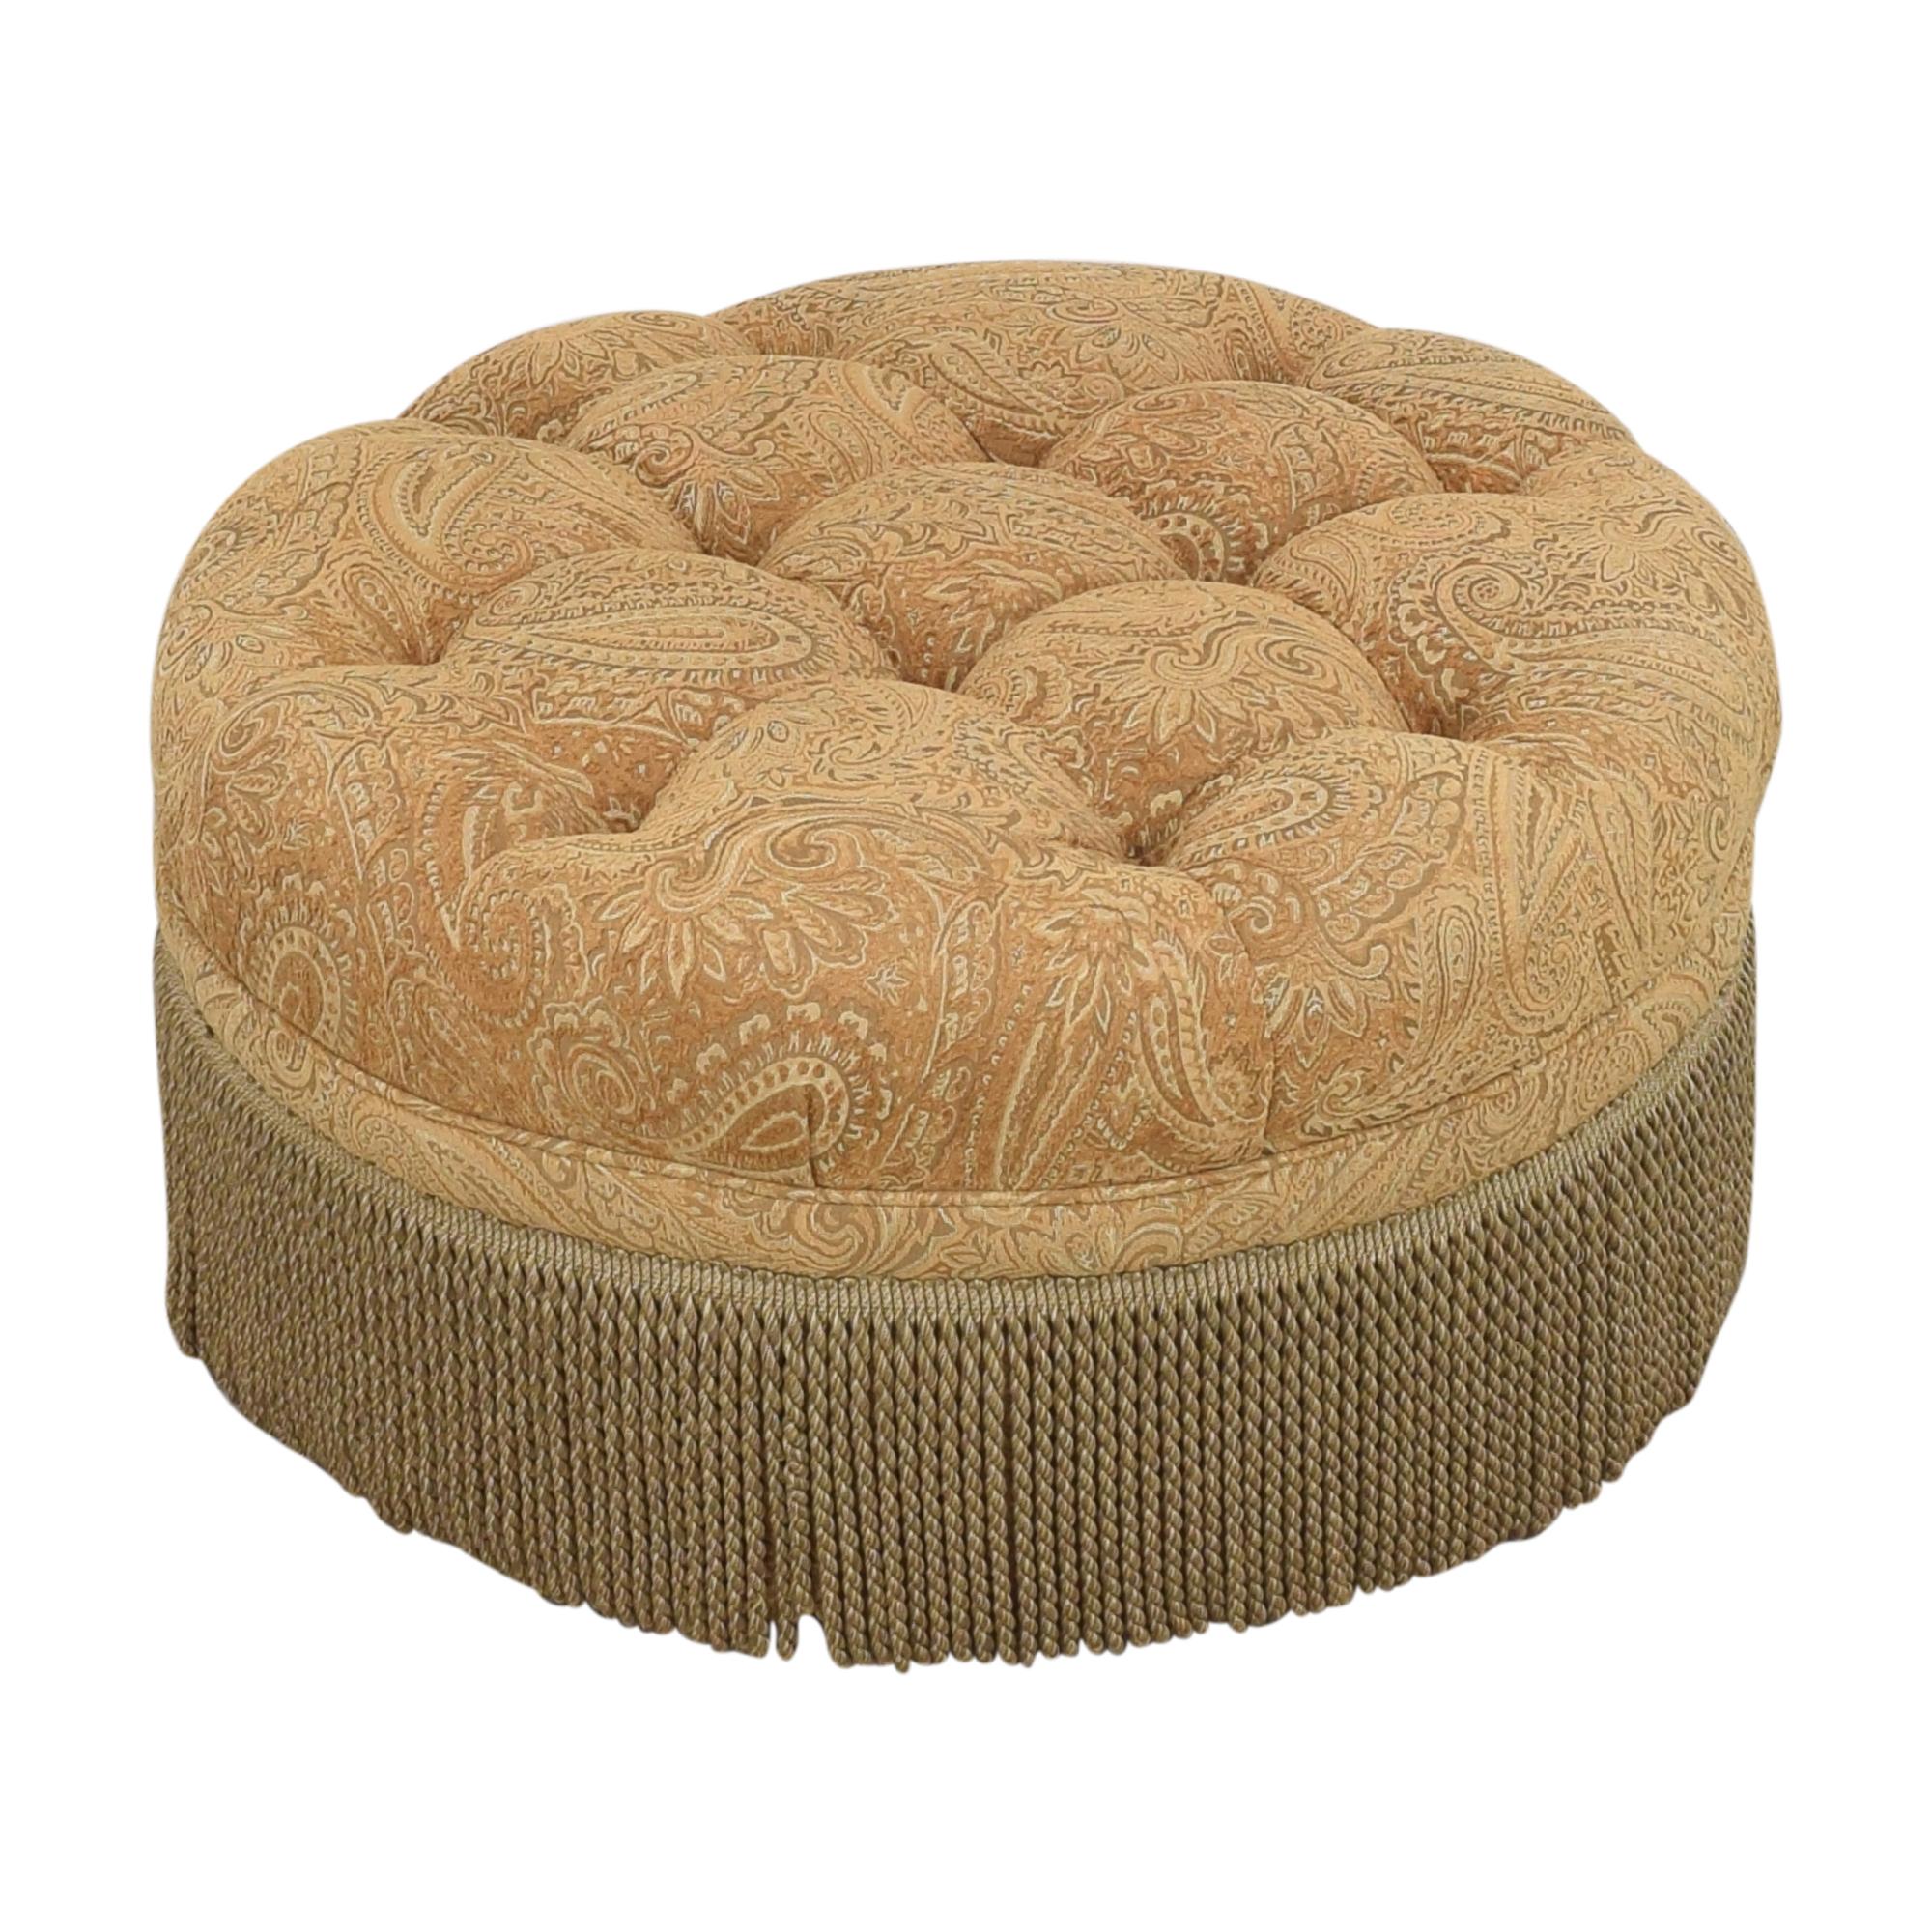 Round Tufted Fringe Ottoman tan